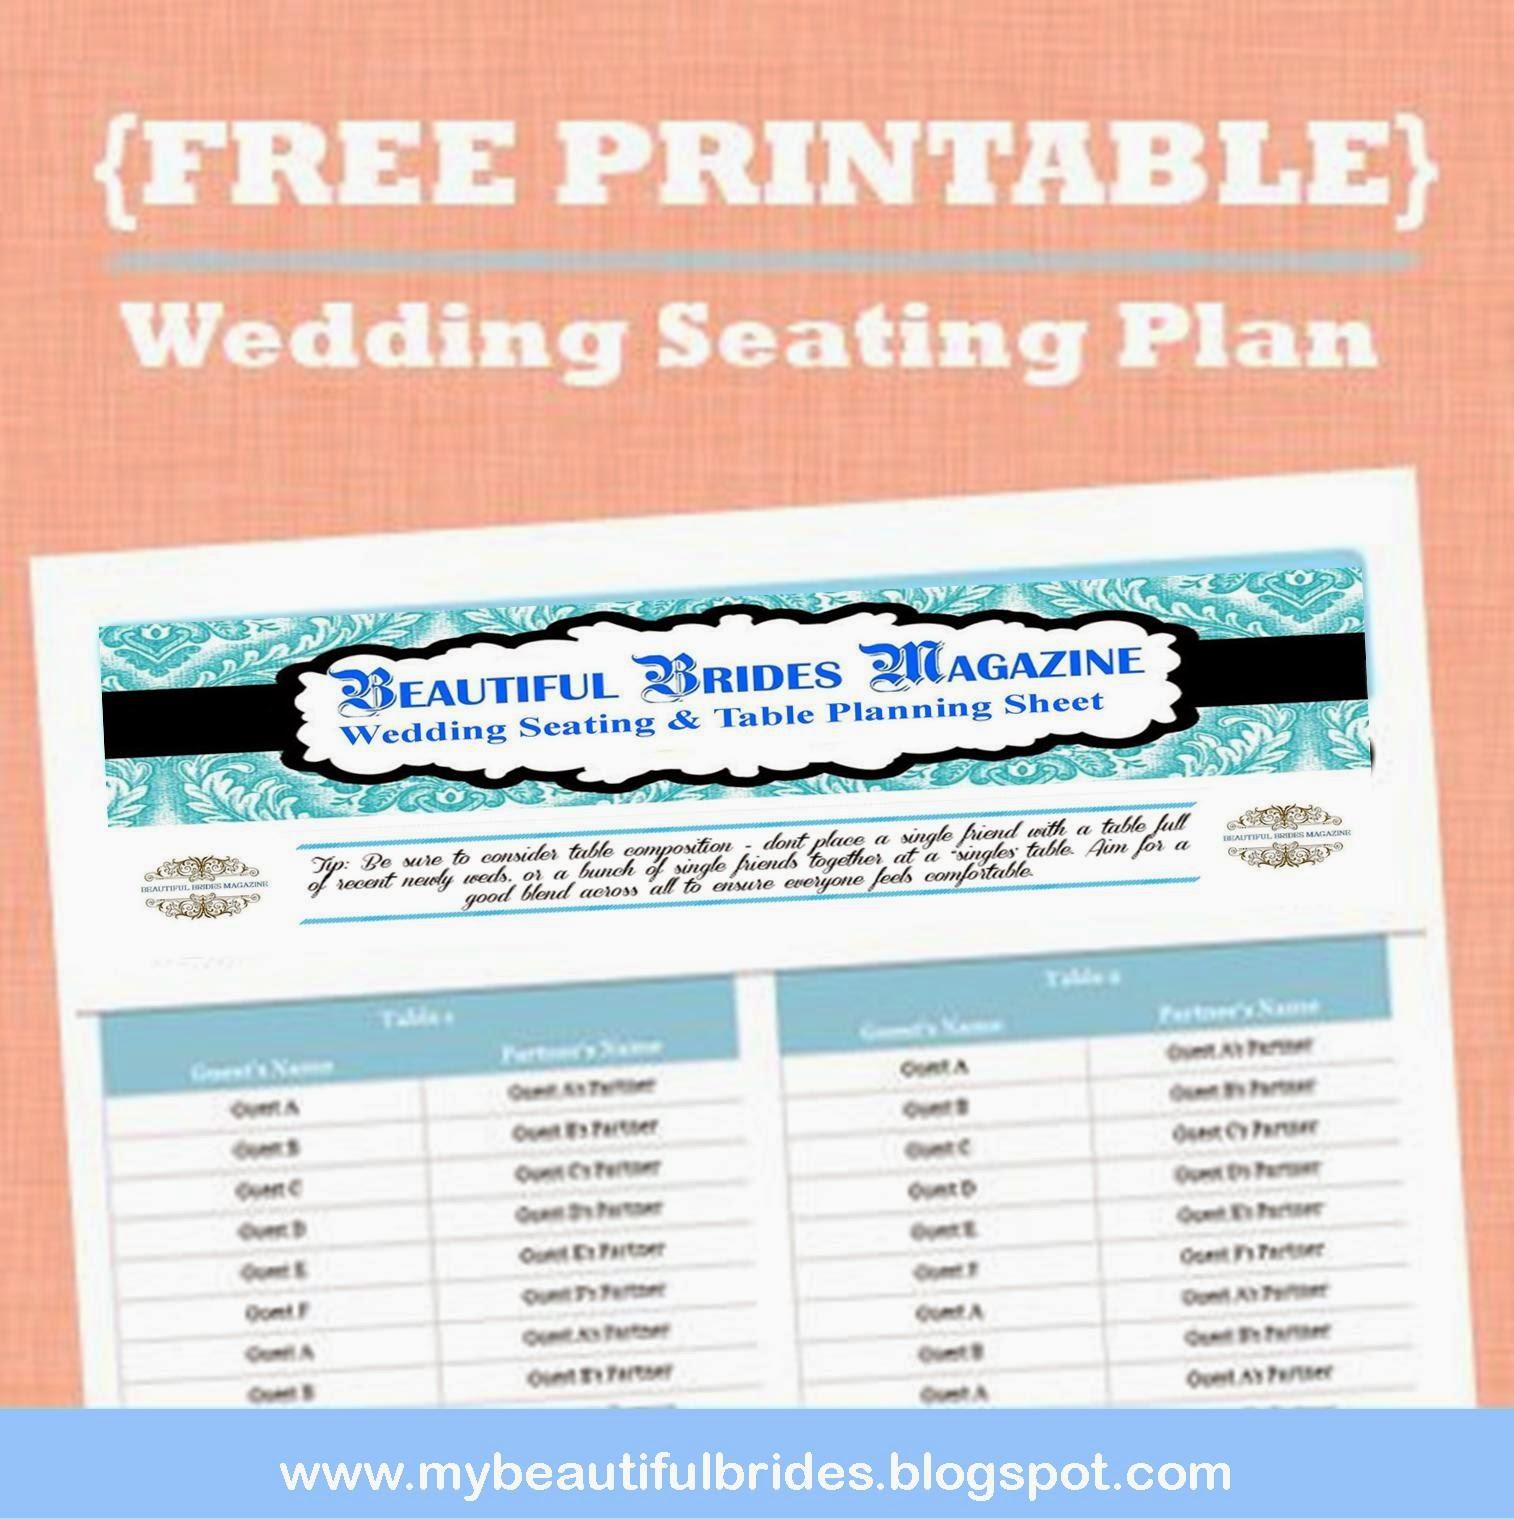 Beautiful Brides Magazine Wedding Table Planner Seating